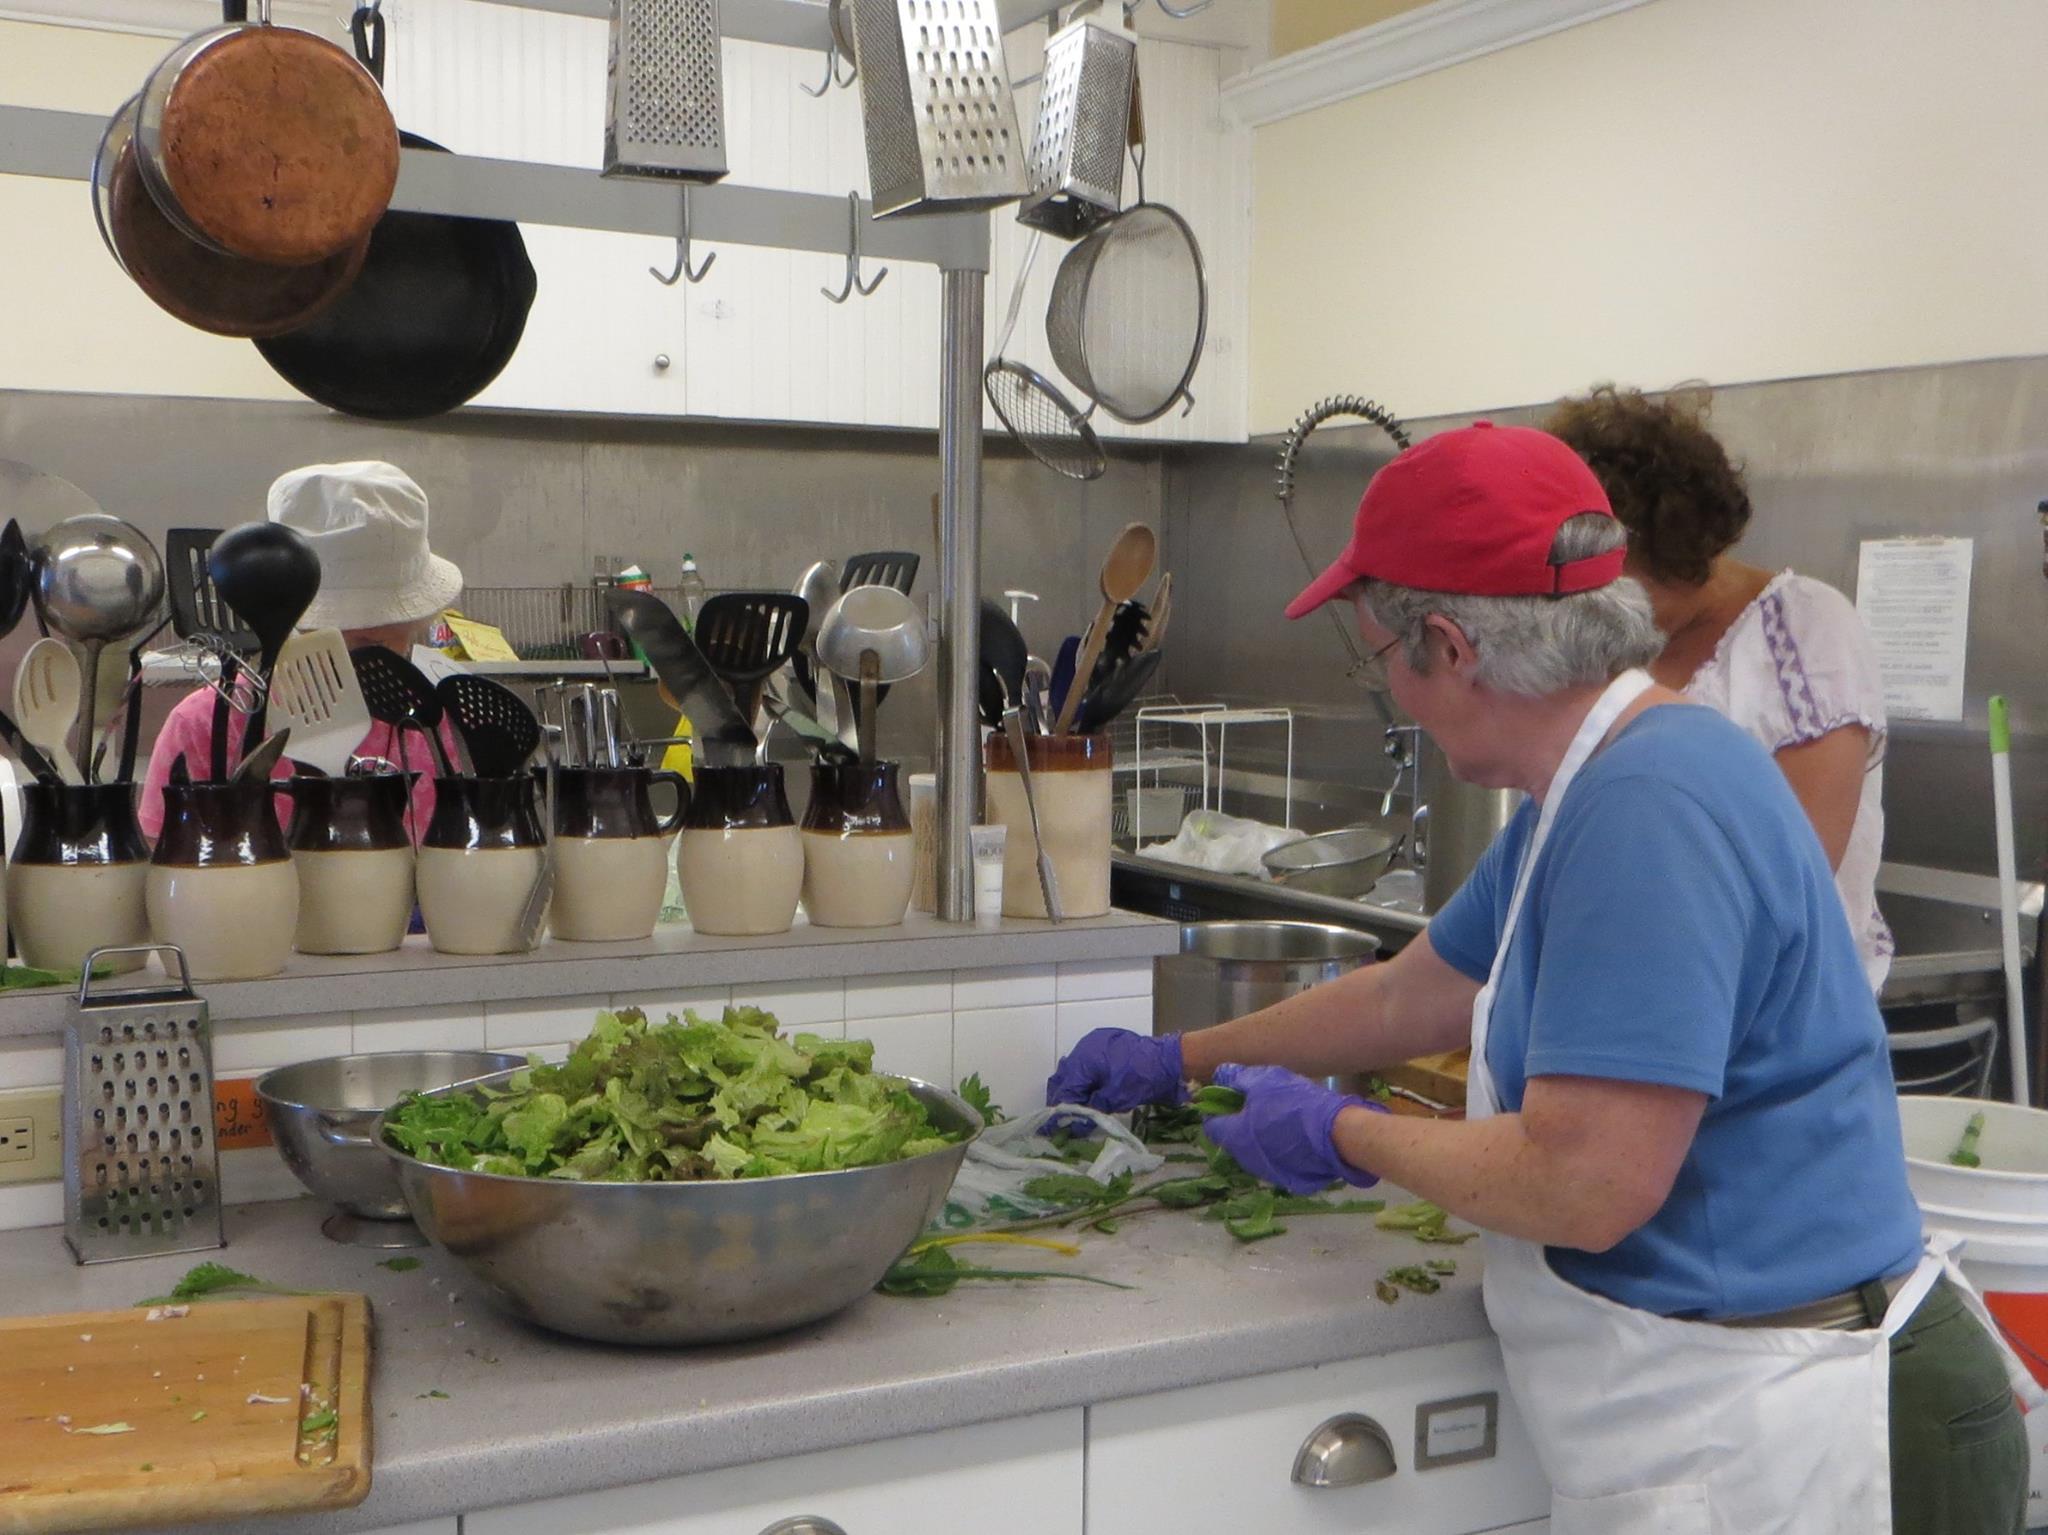 Volunteers in kitchen prepare salad greens for community lunch.